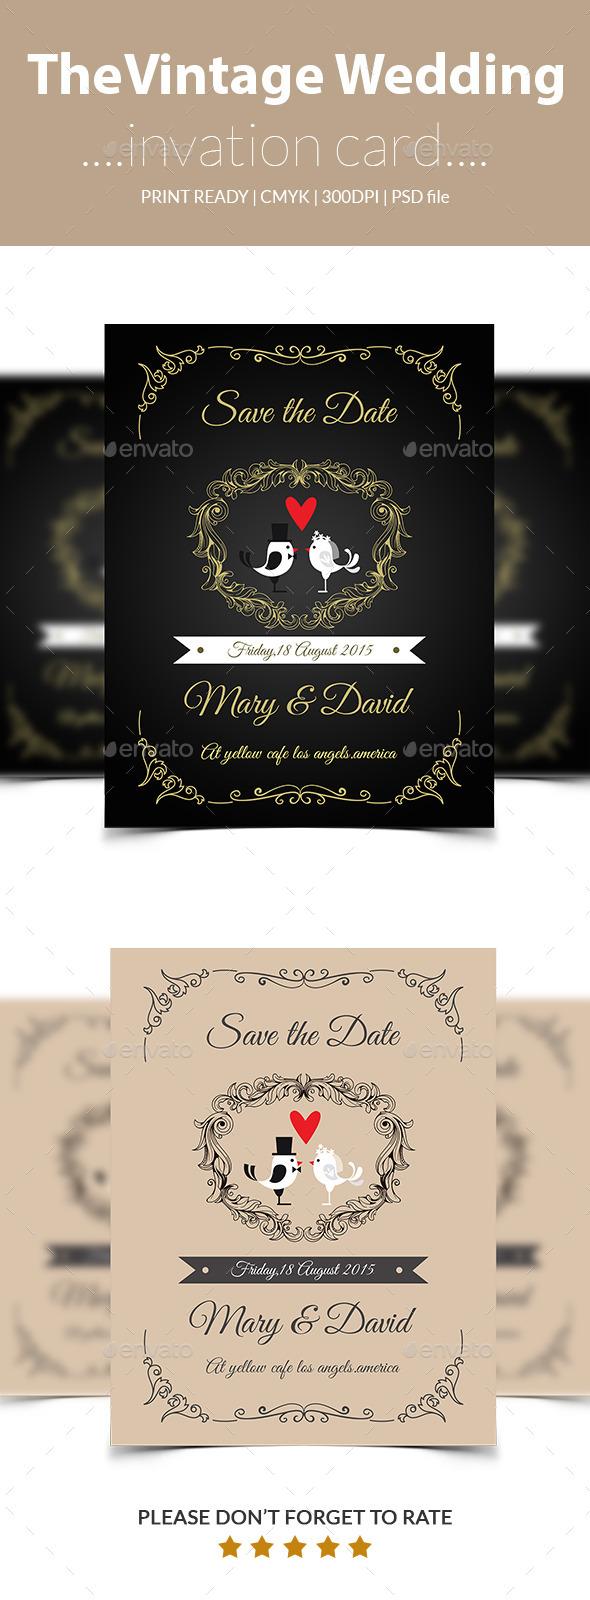 Vintage wedding inviation card - Weddings Cards & Invites